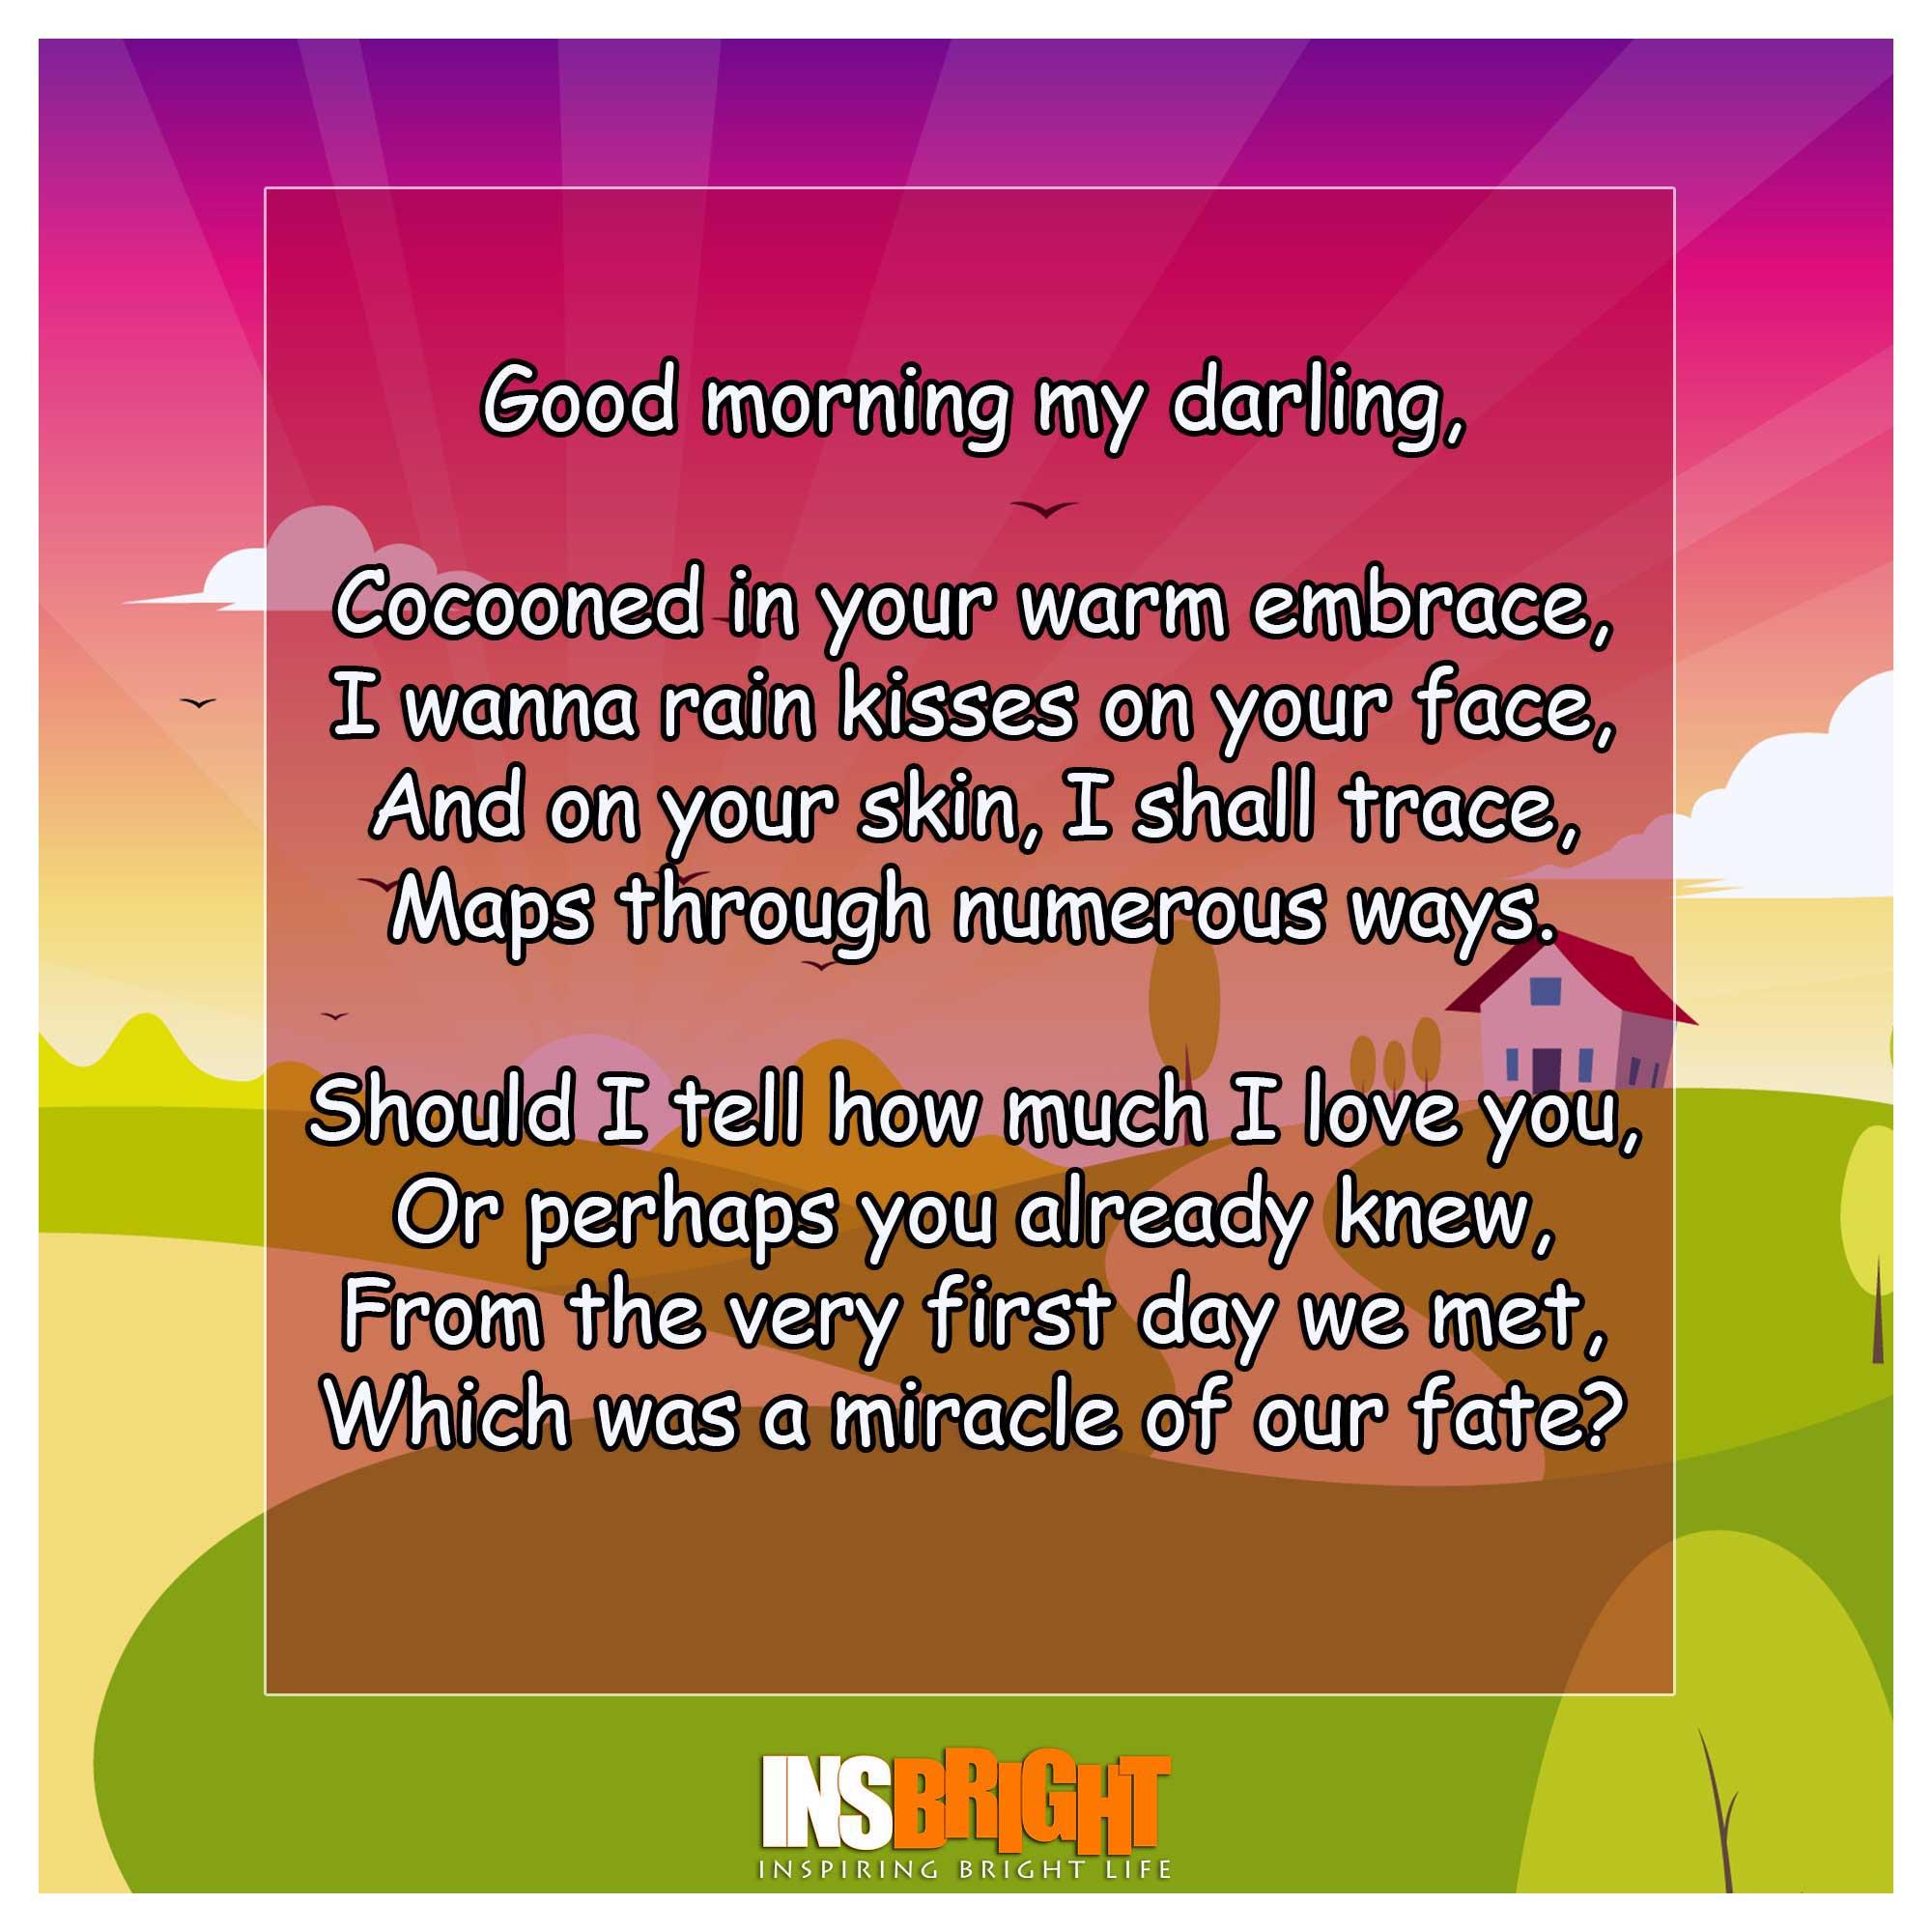 good morning darling hope you slept well poem